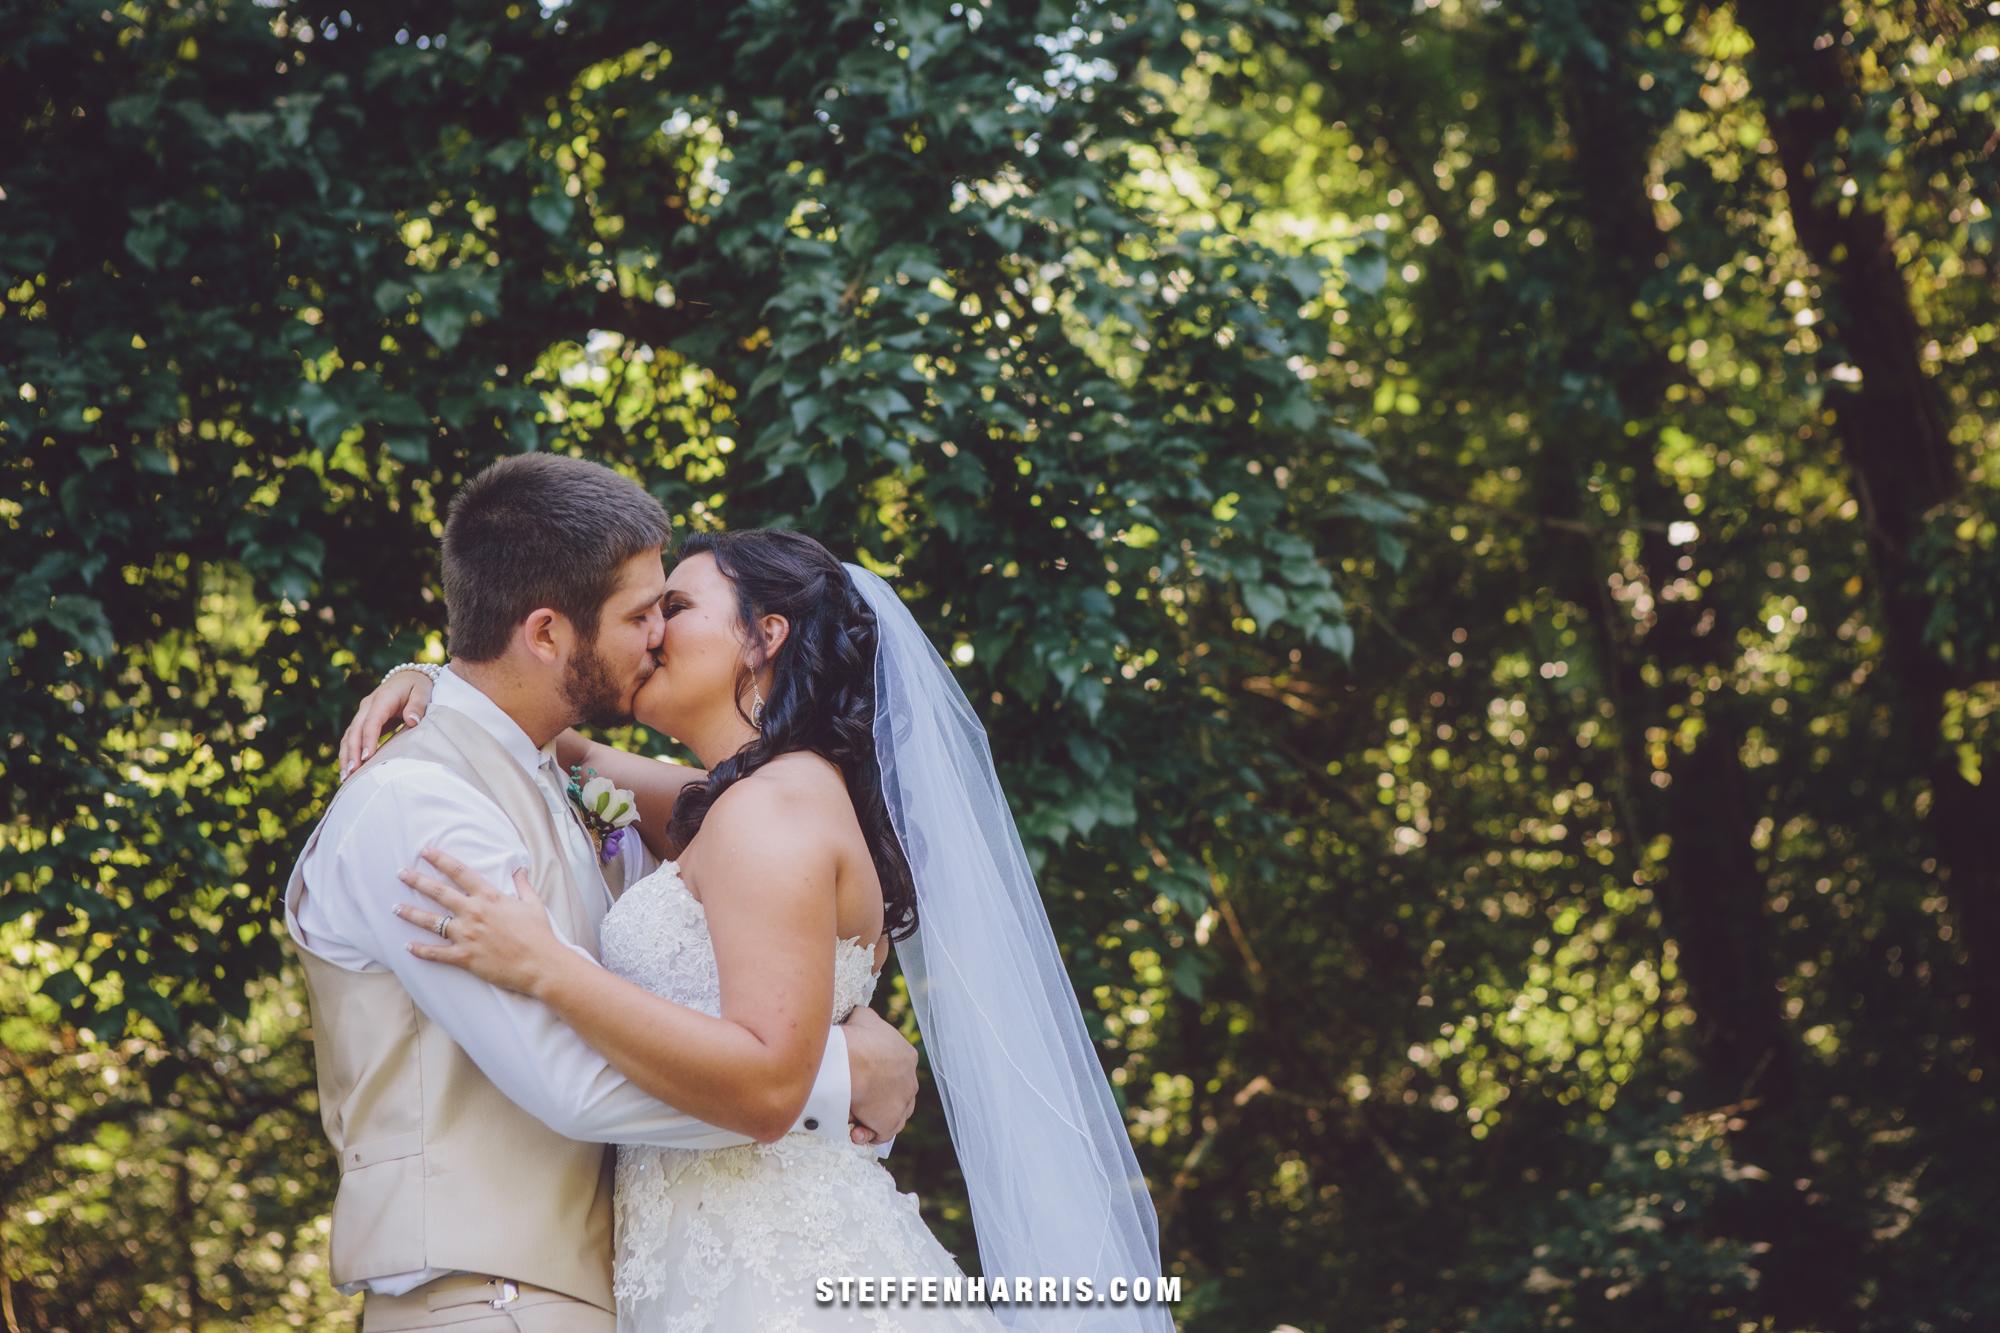 casey-aaron-salem-il-wedding-photography-51